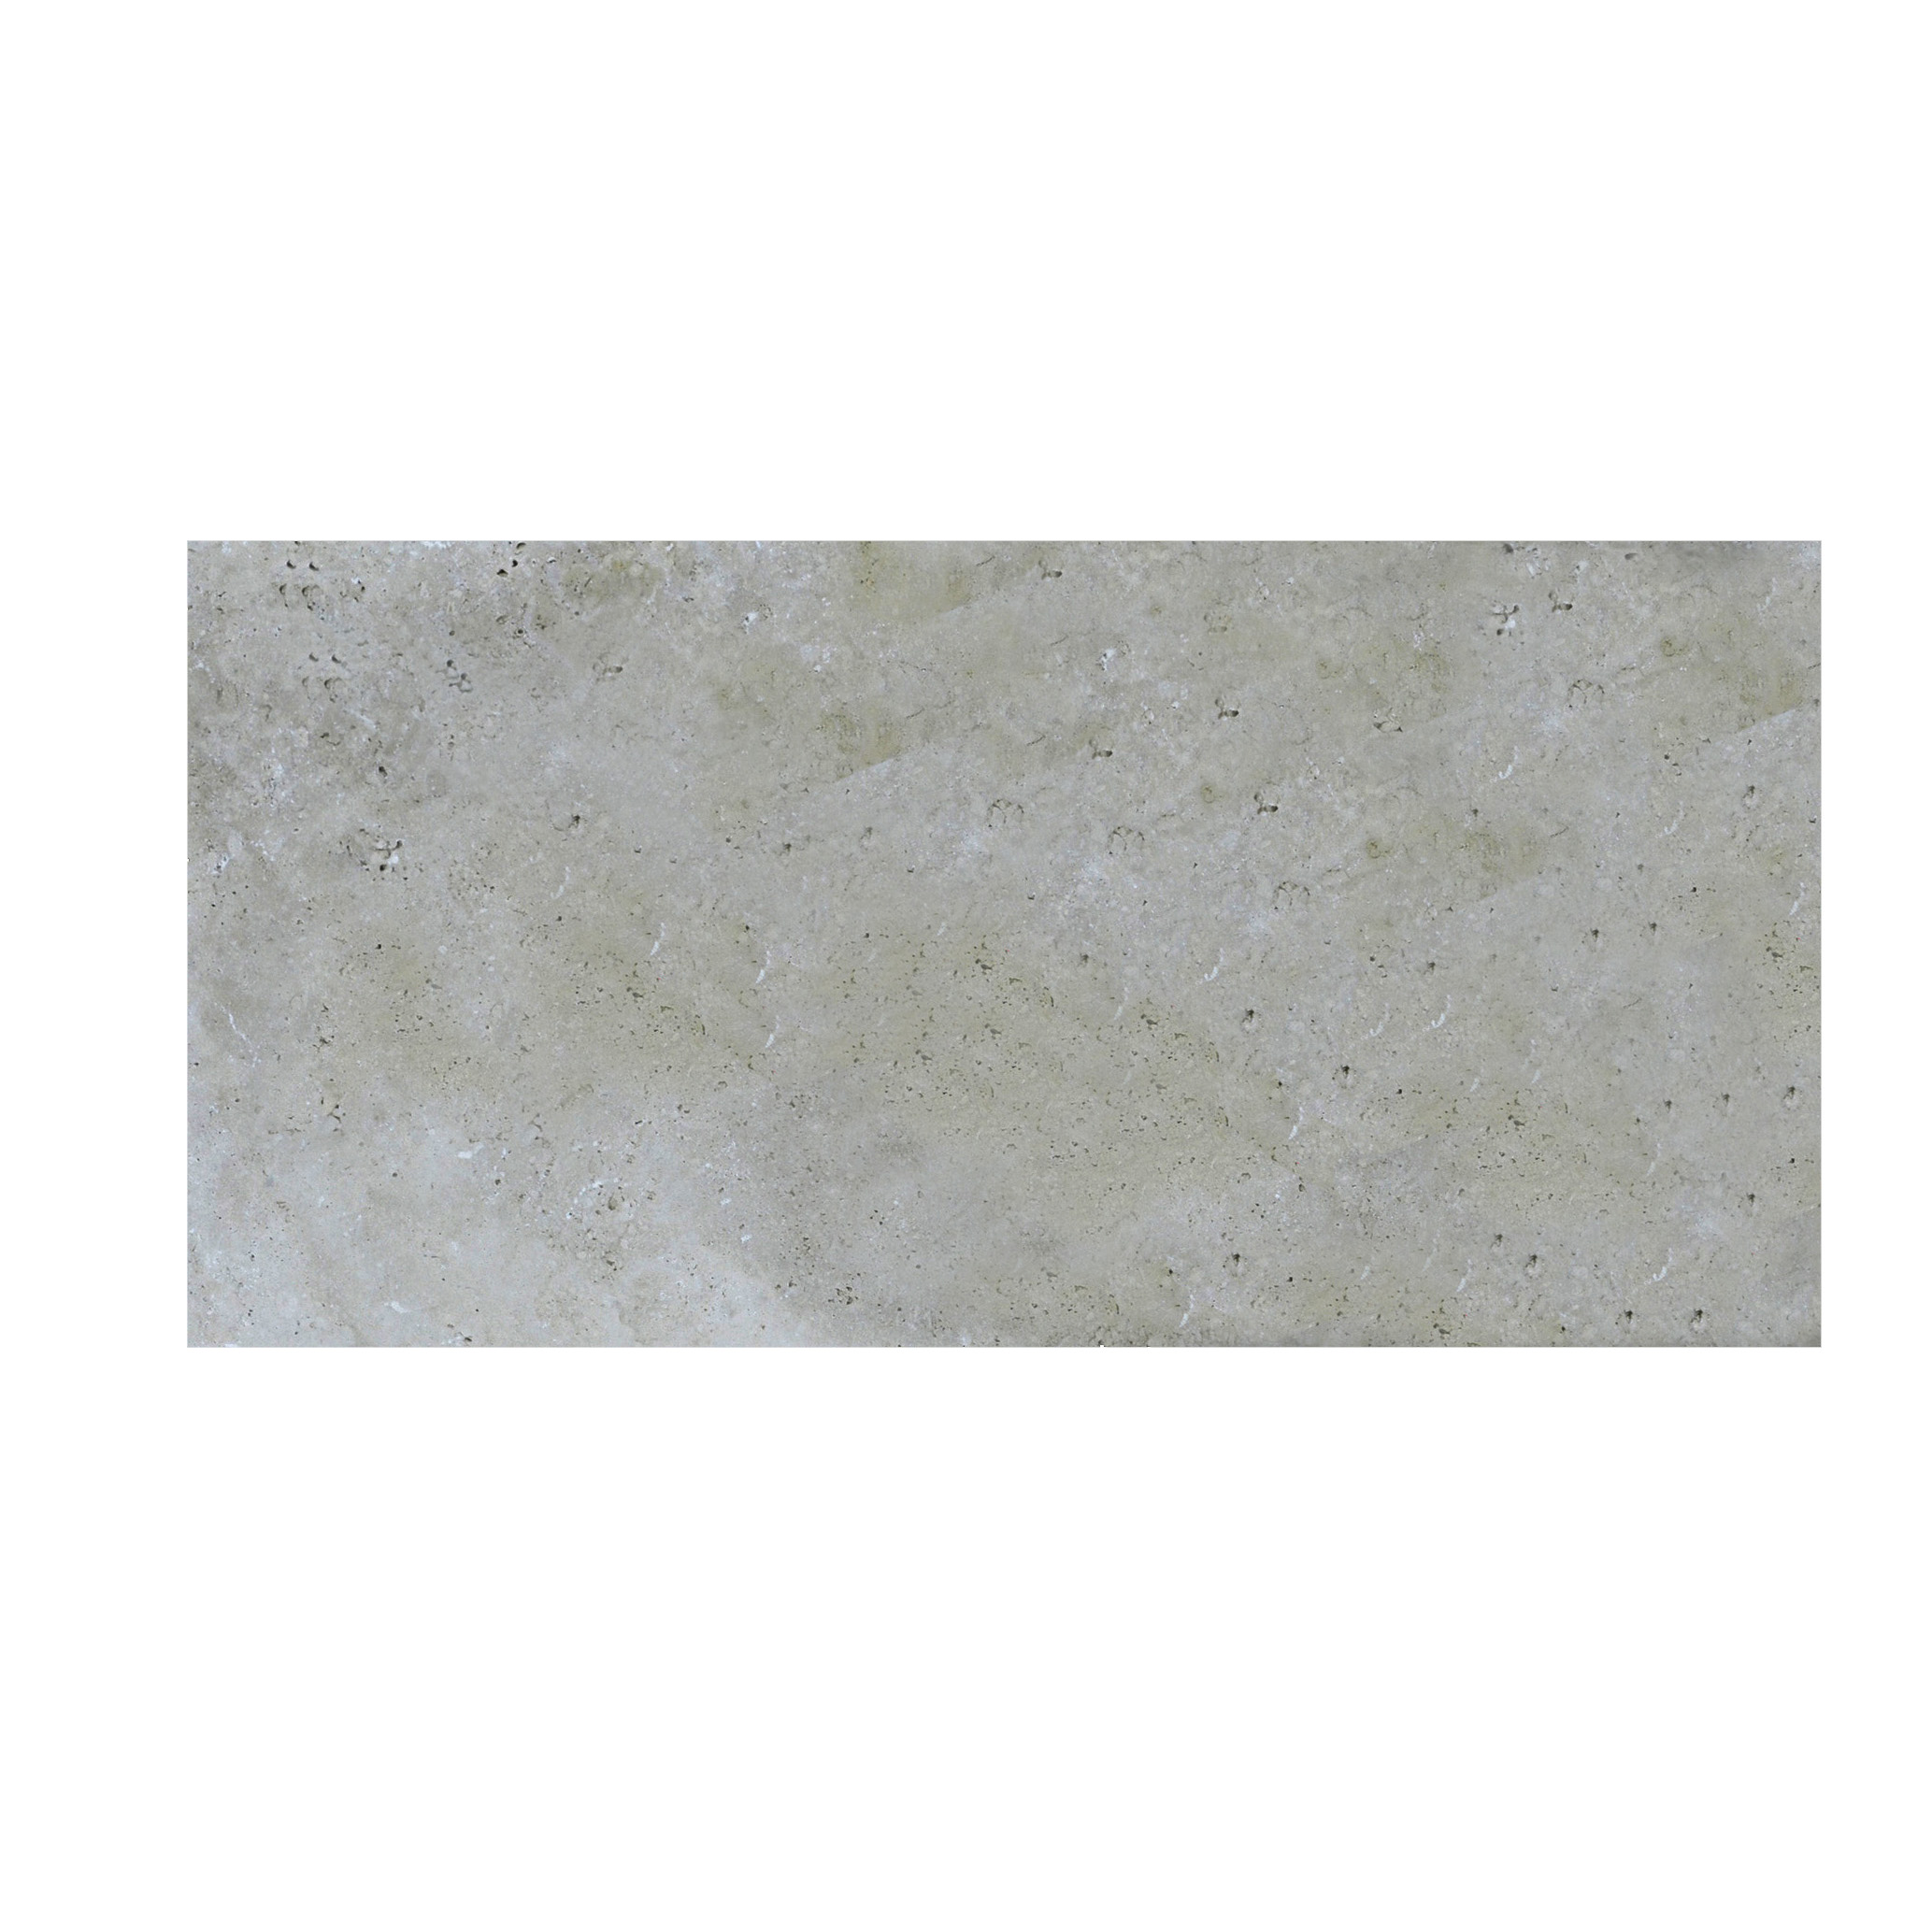 Toscana Tumbled Travertine Pavers 8x16-pavers sale-Atlantic Stone Source